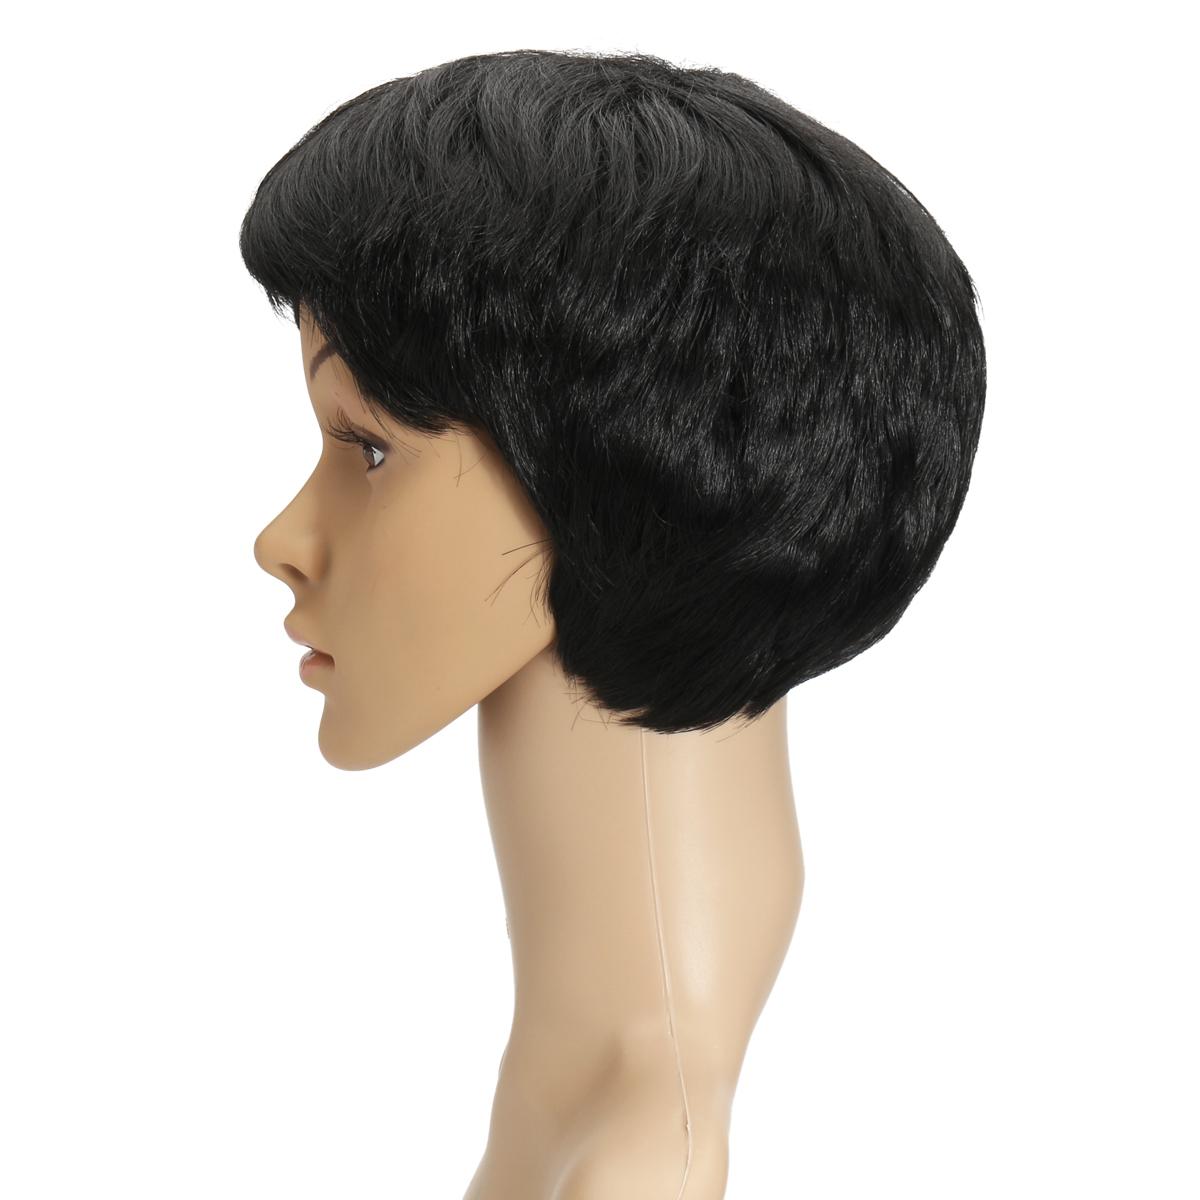 Sexy Short Cut Wavy Black Curly Wig Women Fashion Cosplay Synthetic Full Wigs